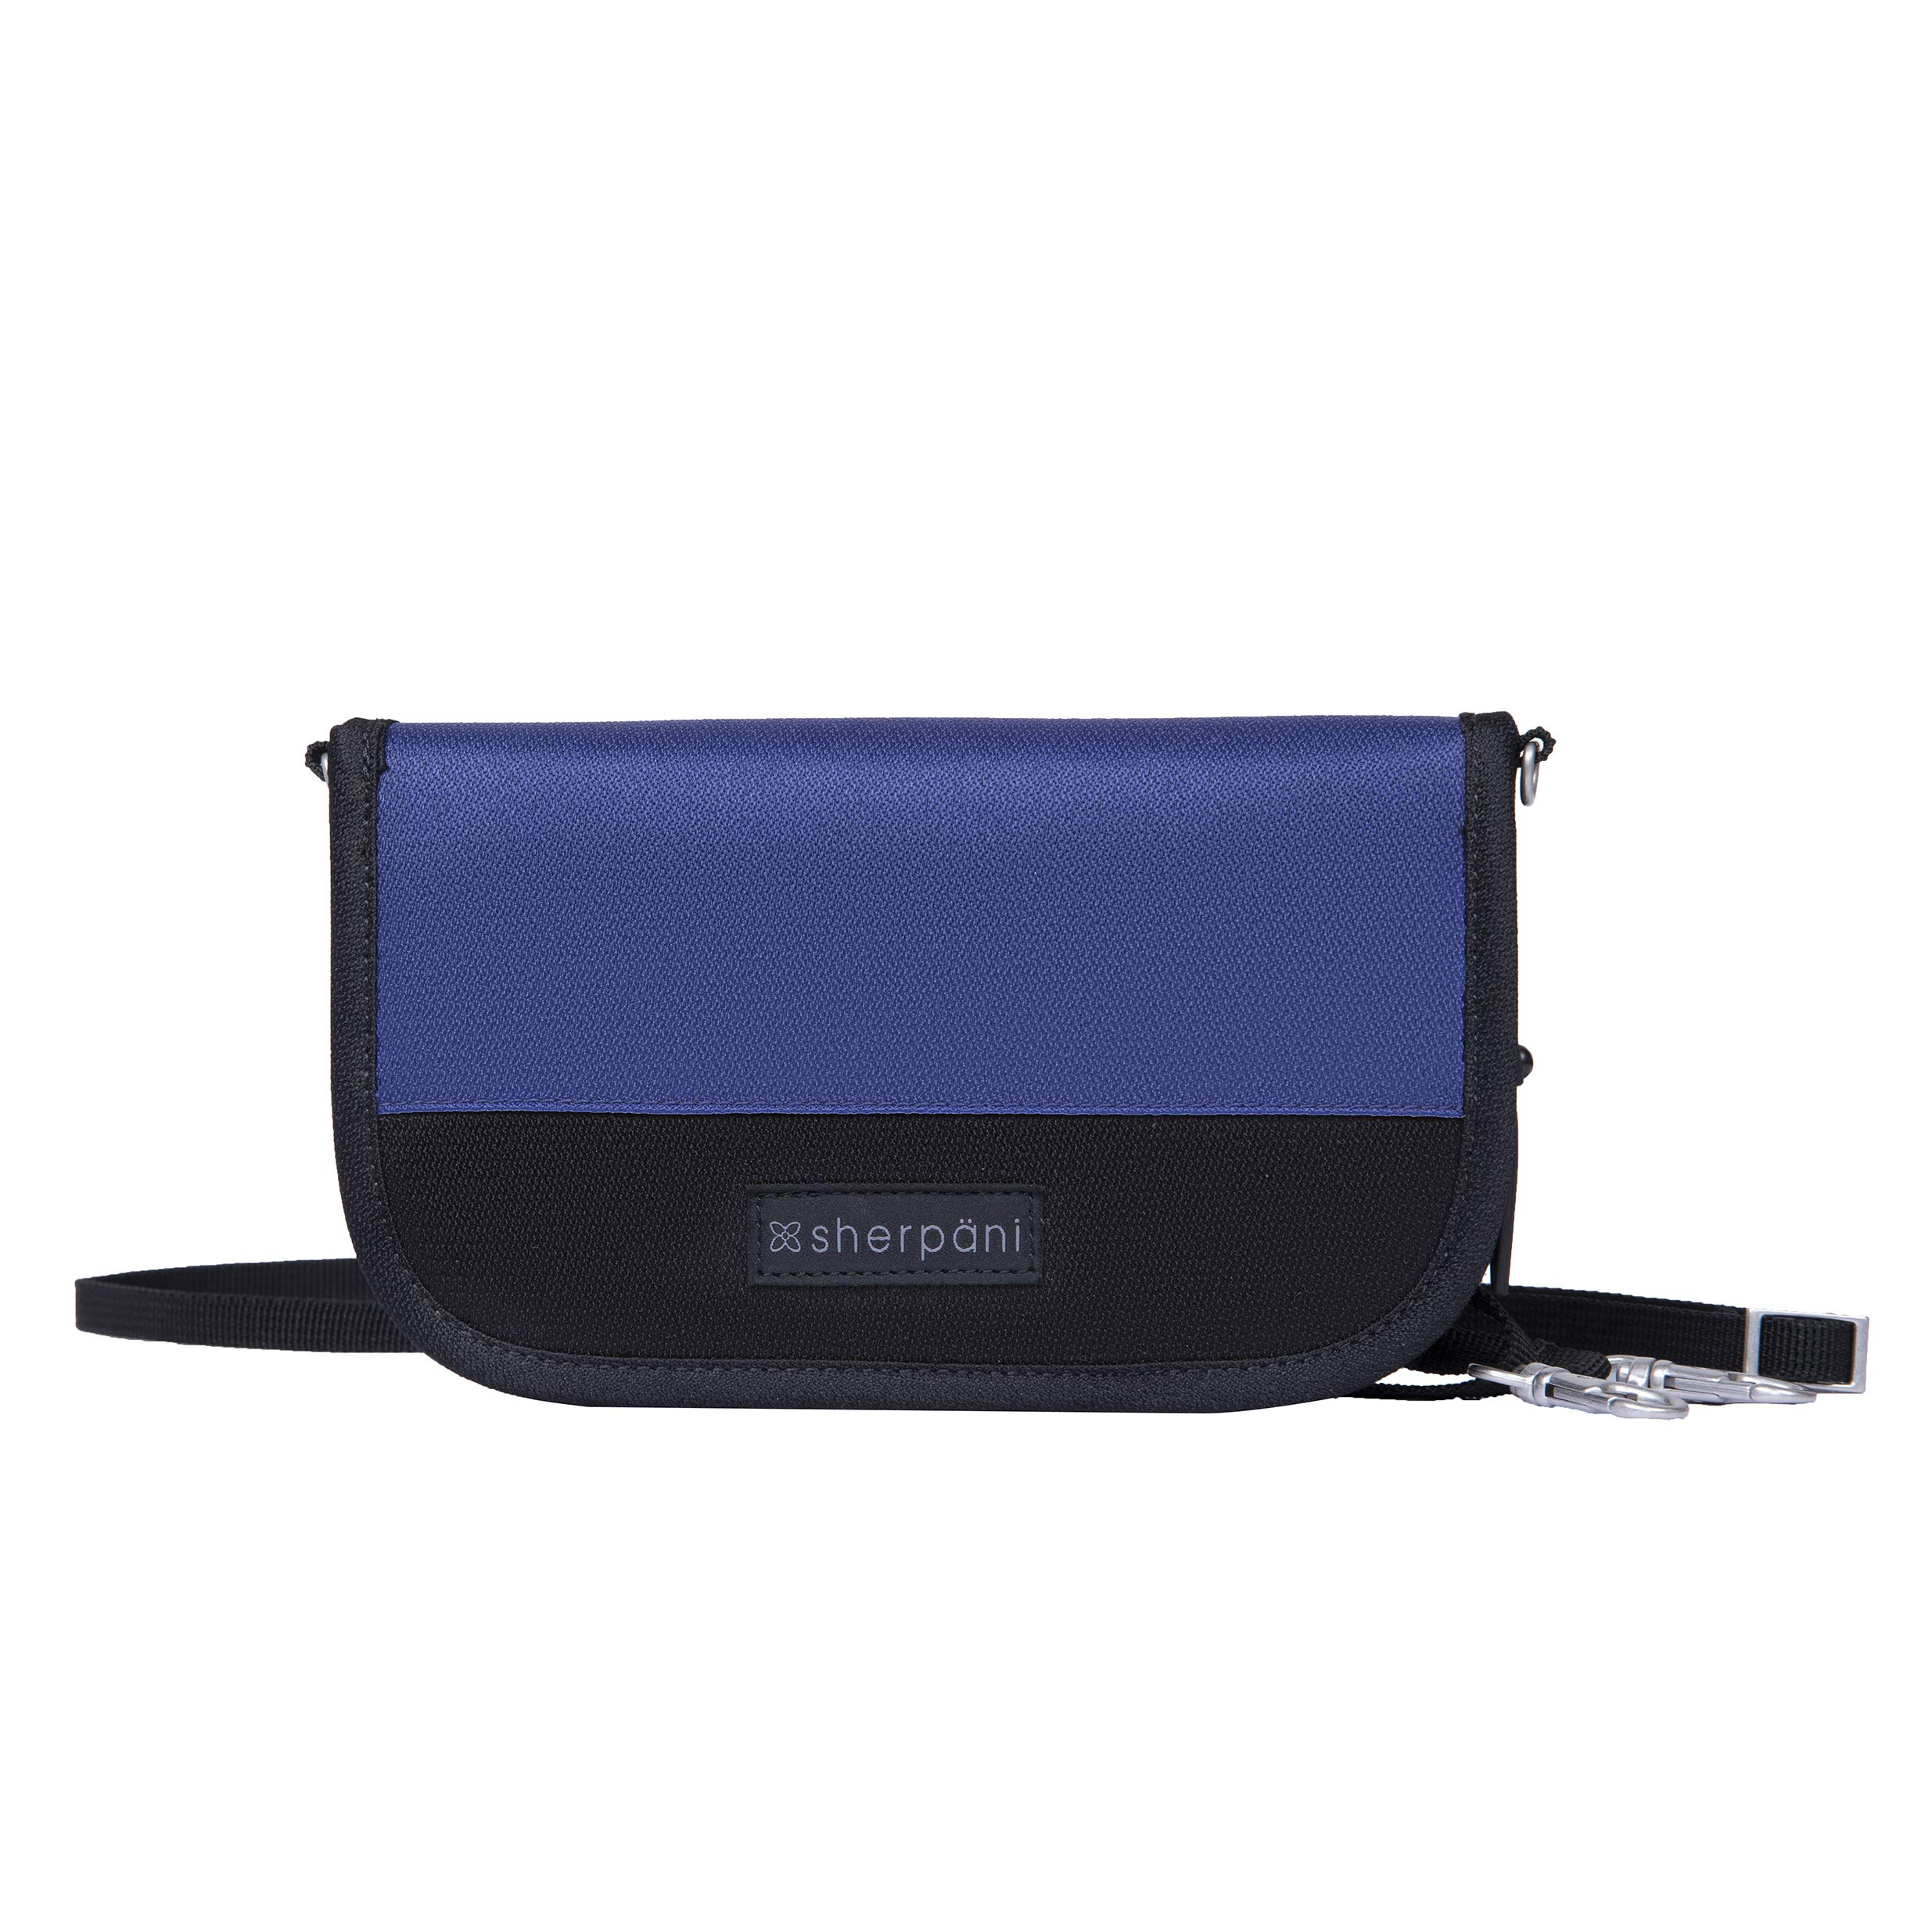 Sherpani Zoe 2.0 Nylon Crossbody Wallet Mini Crossbody Purse Bag Essential Wallet for Women RFID Protection